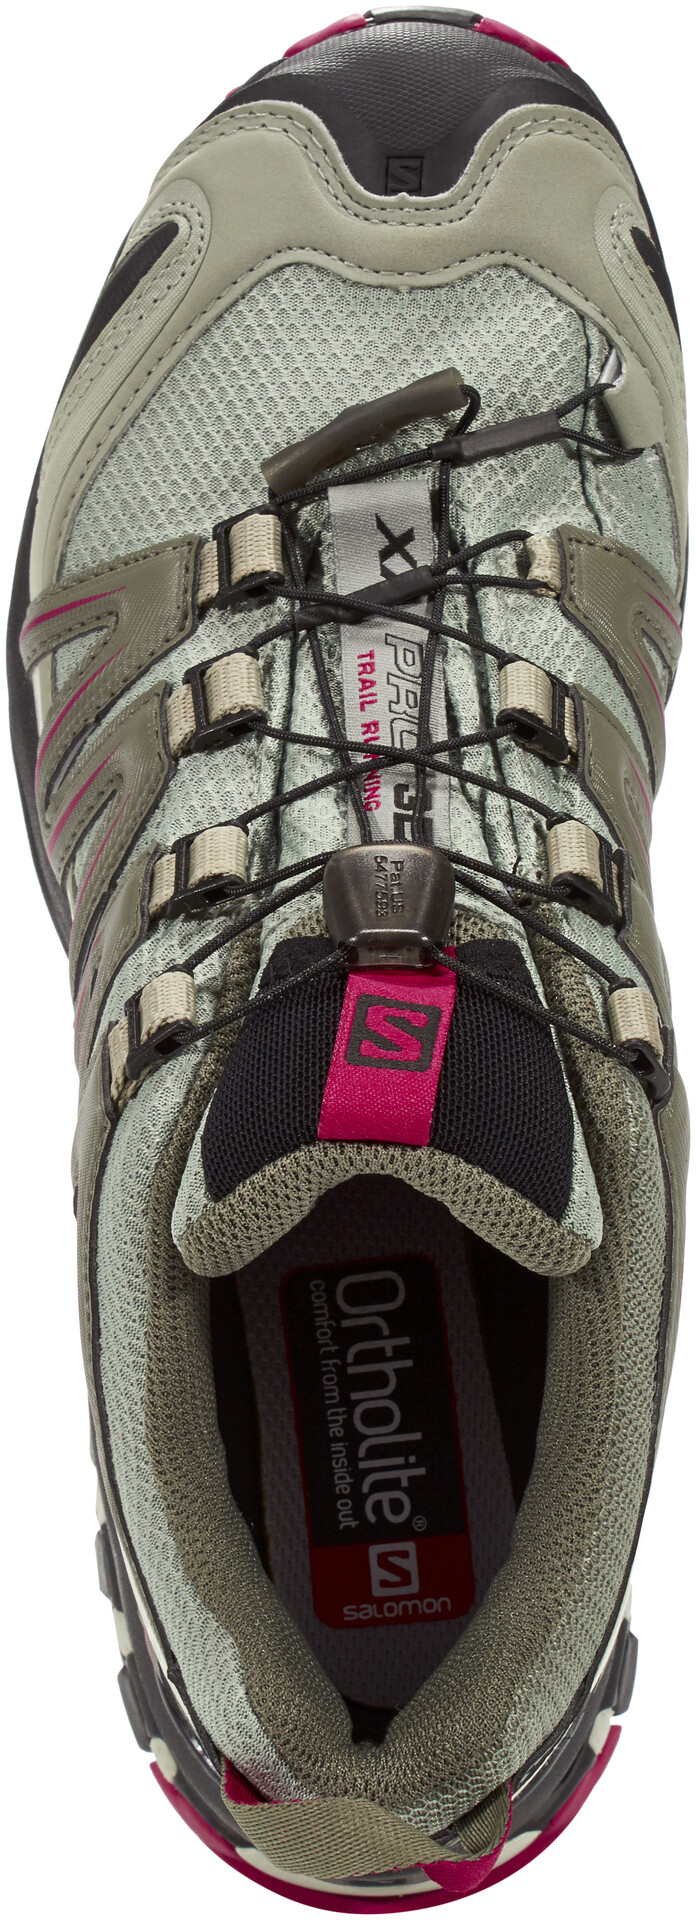 Buy Salomon XA Comp 8 Grey Running Shoes for Women at Best